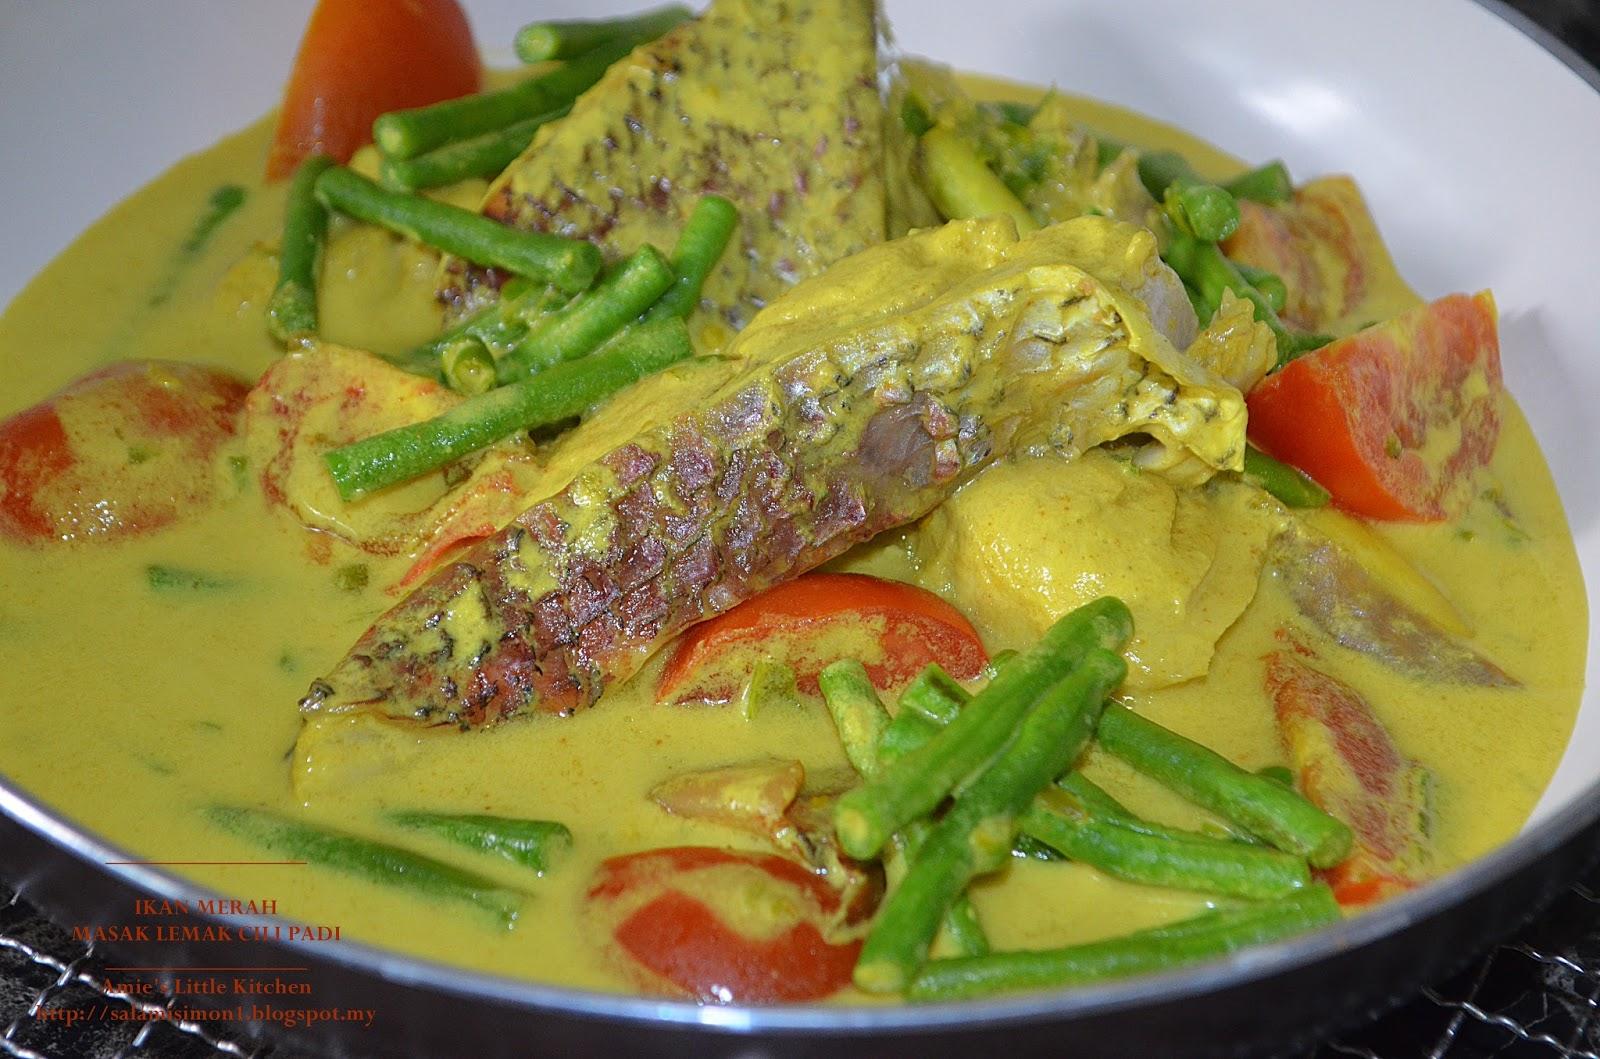 Amie S Little Kitchen Ikan Merah Masak Lemak Cili Padi